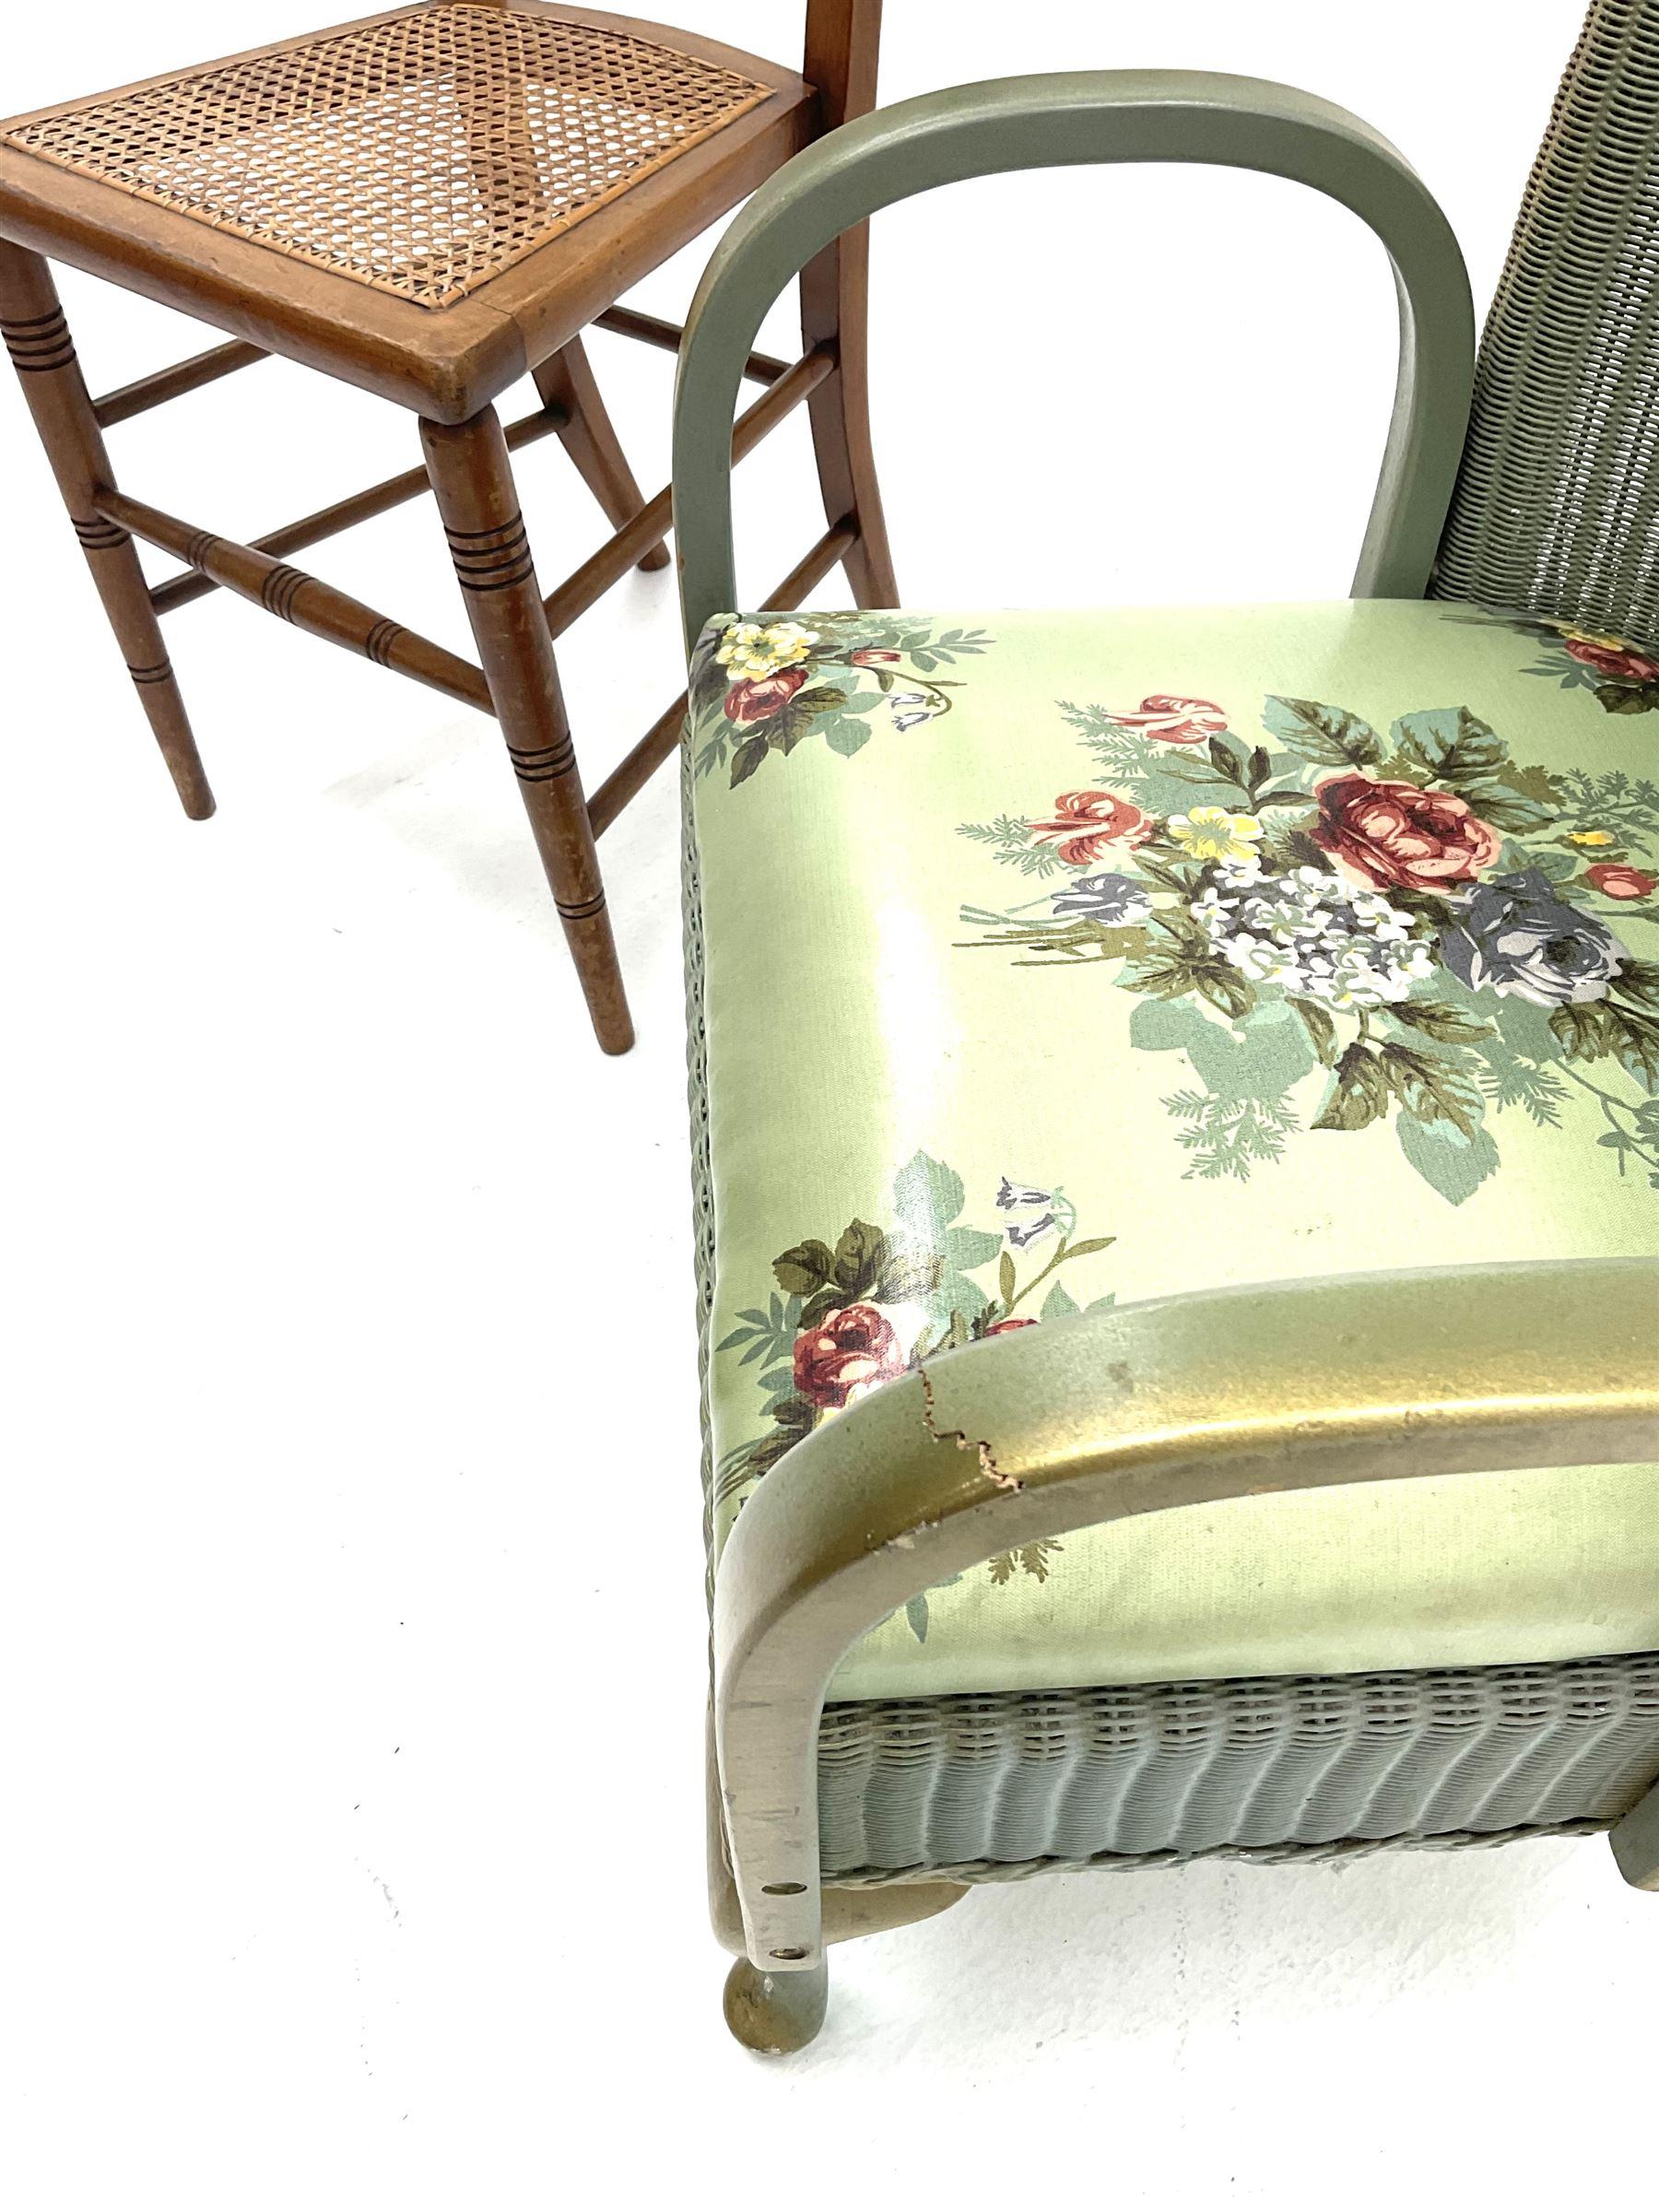 Loyd loom style chair - Image 2 of 3